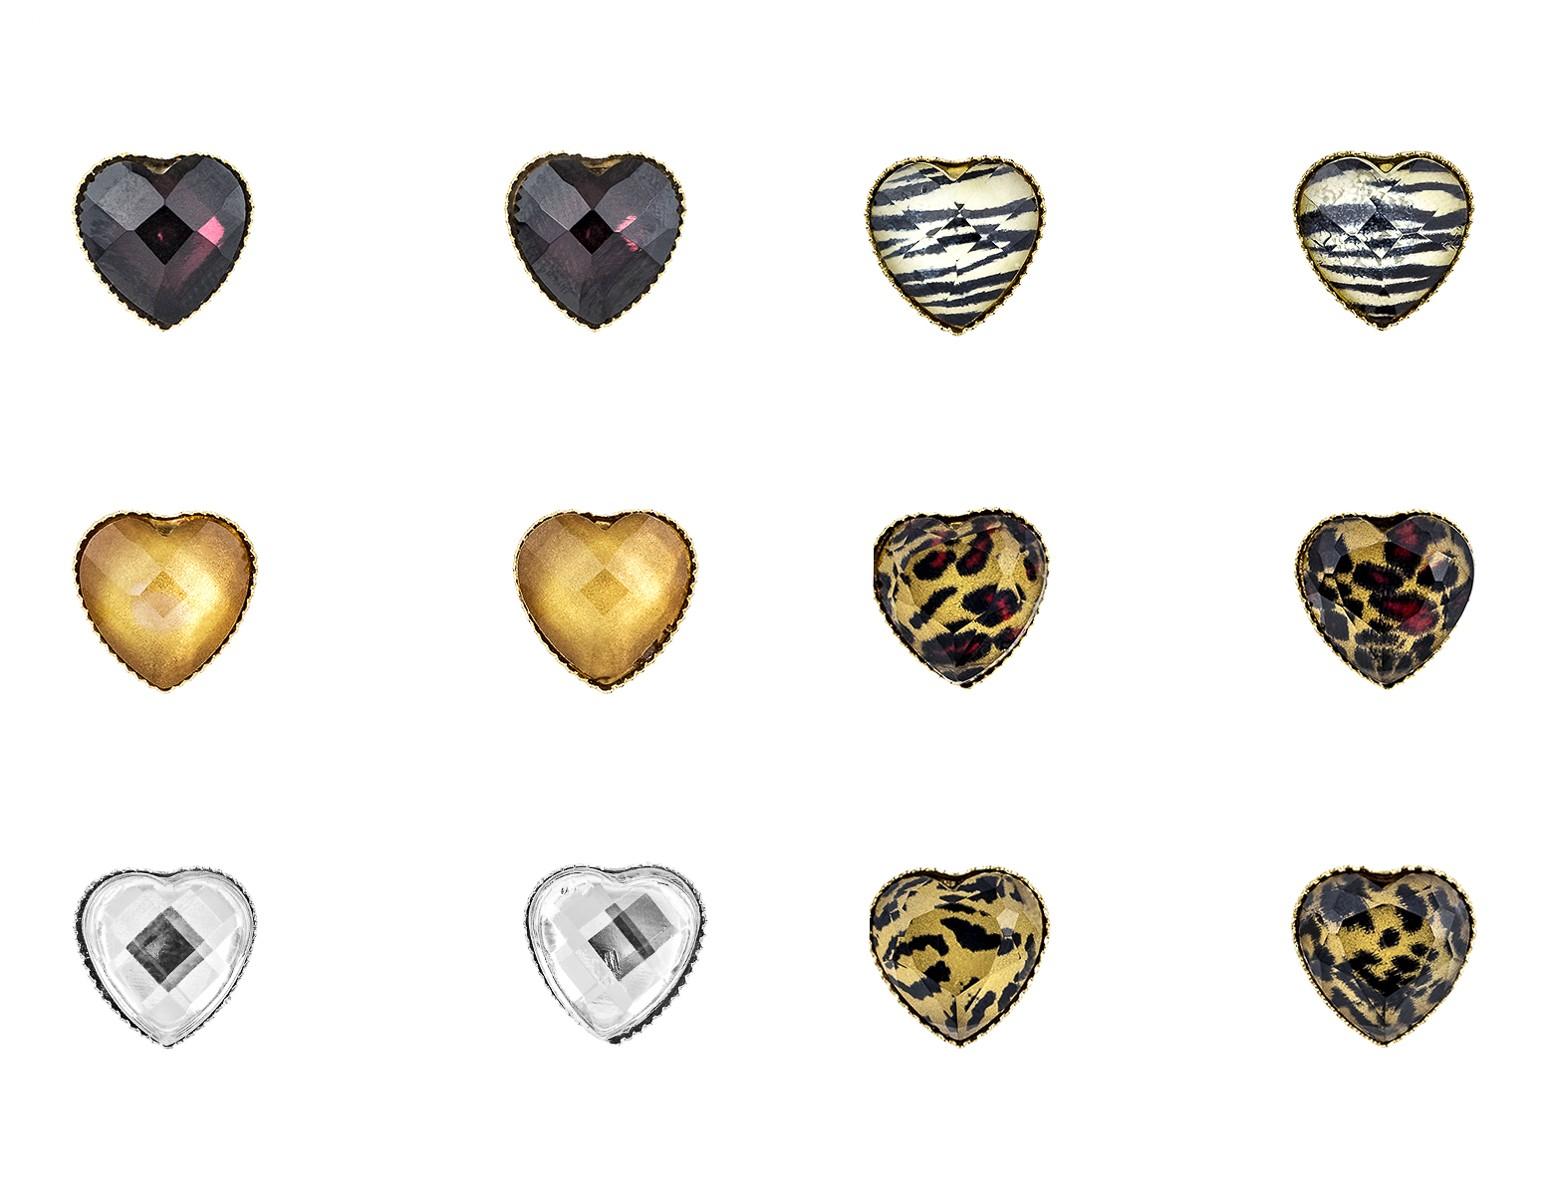 Heart Design Crystal Stud Earring Set of 6